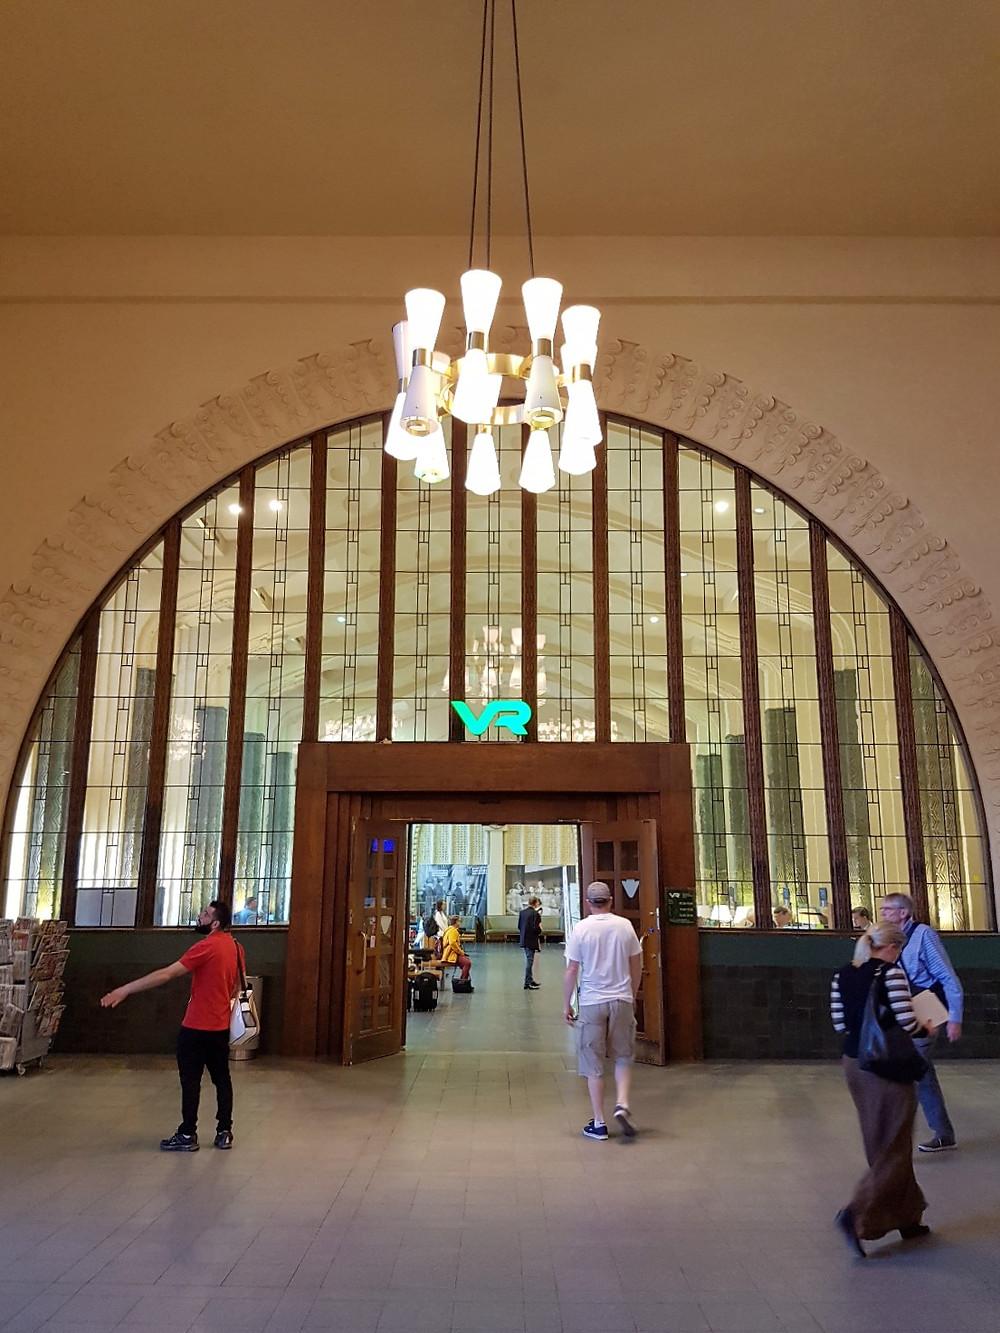 Helsinki Railway Station Interior, Finland